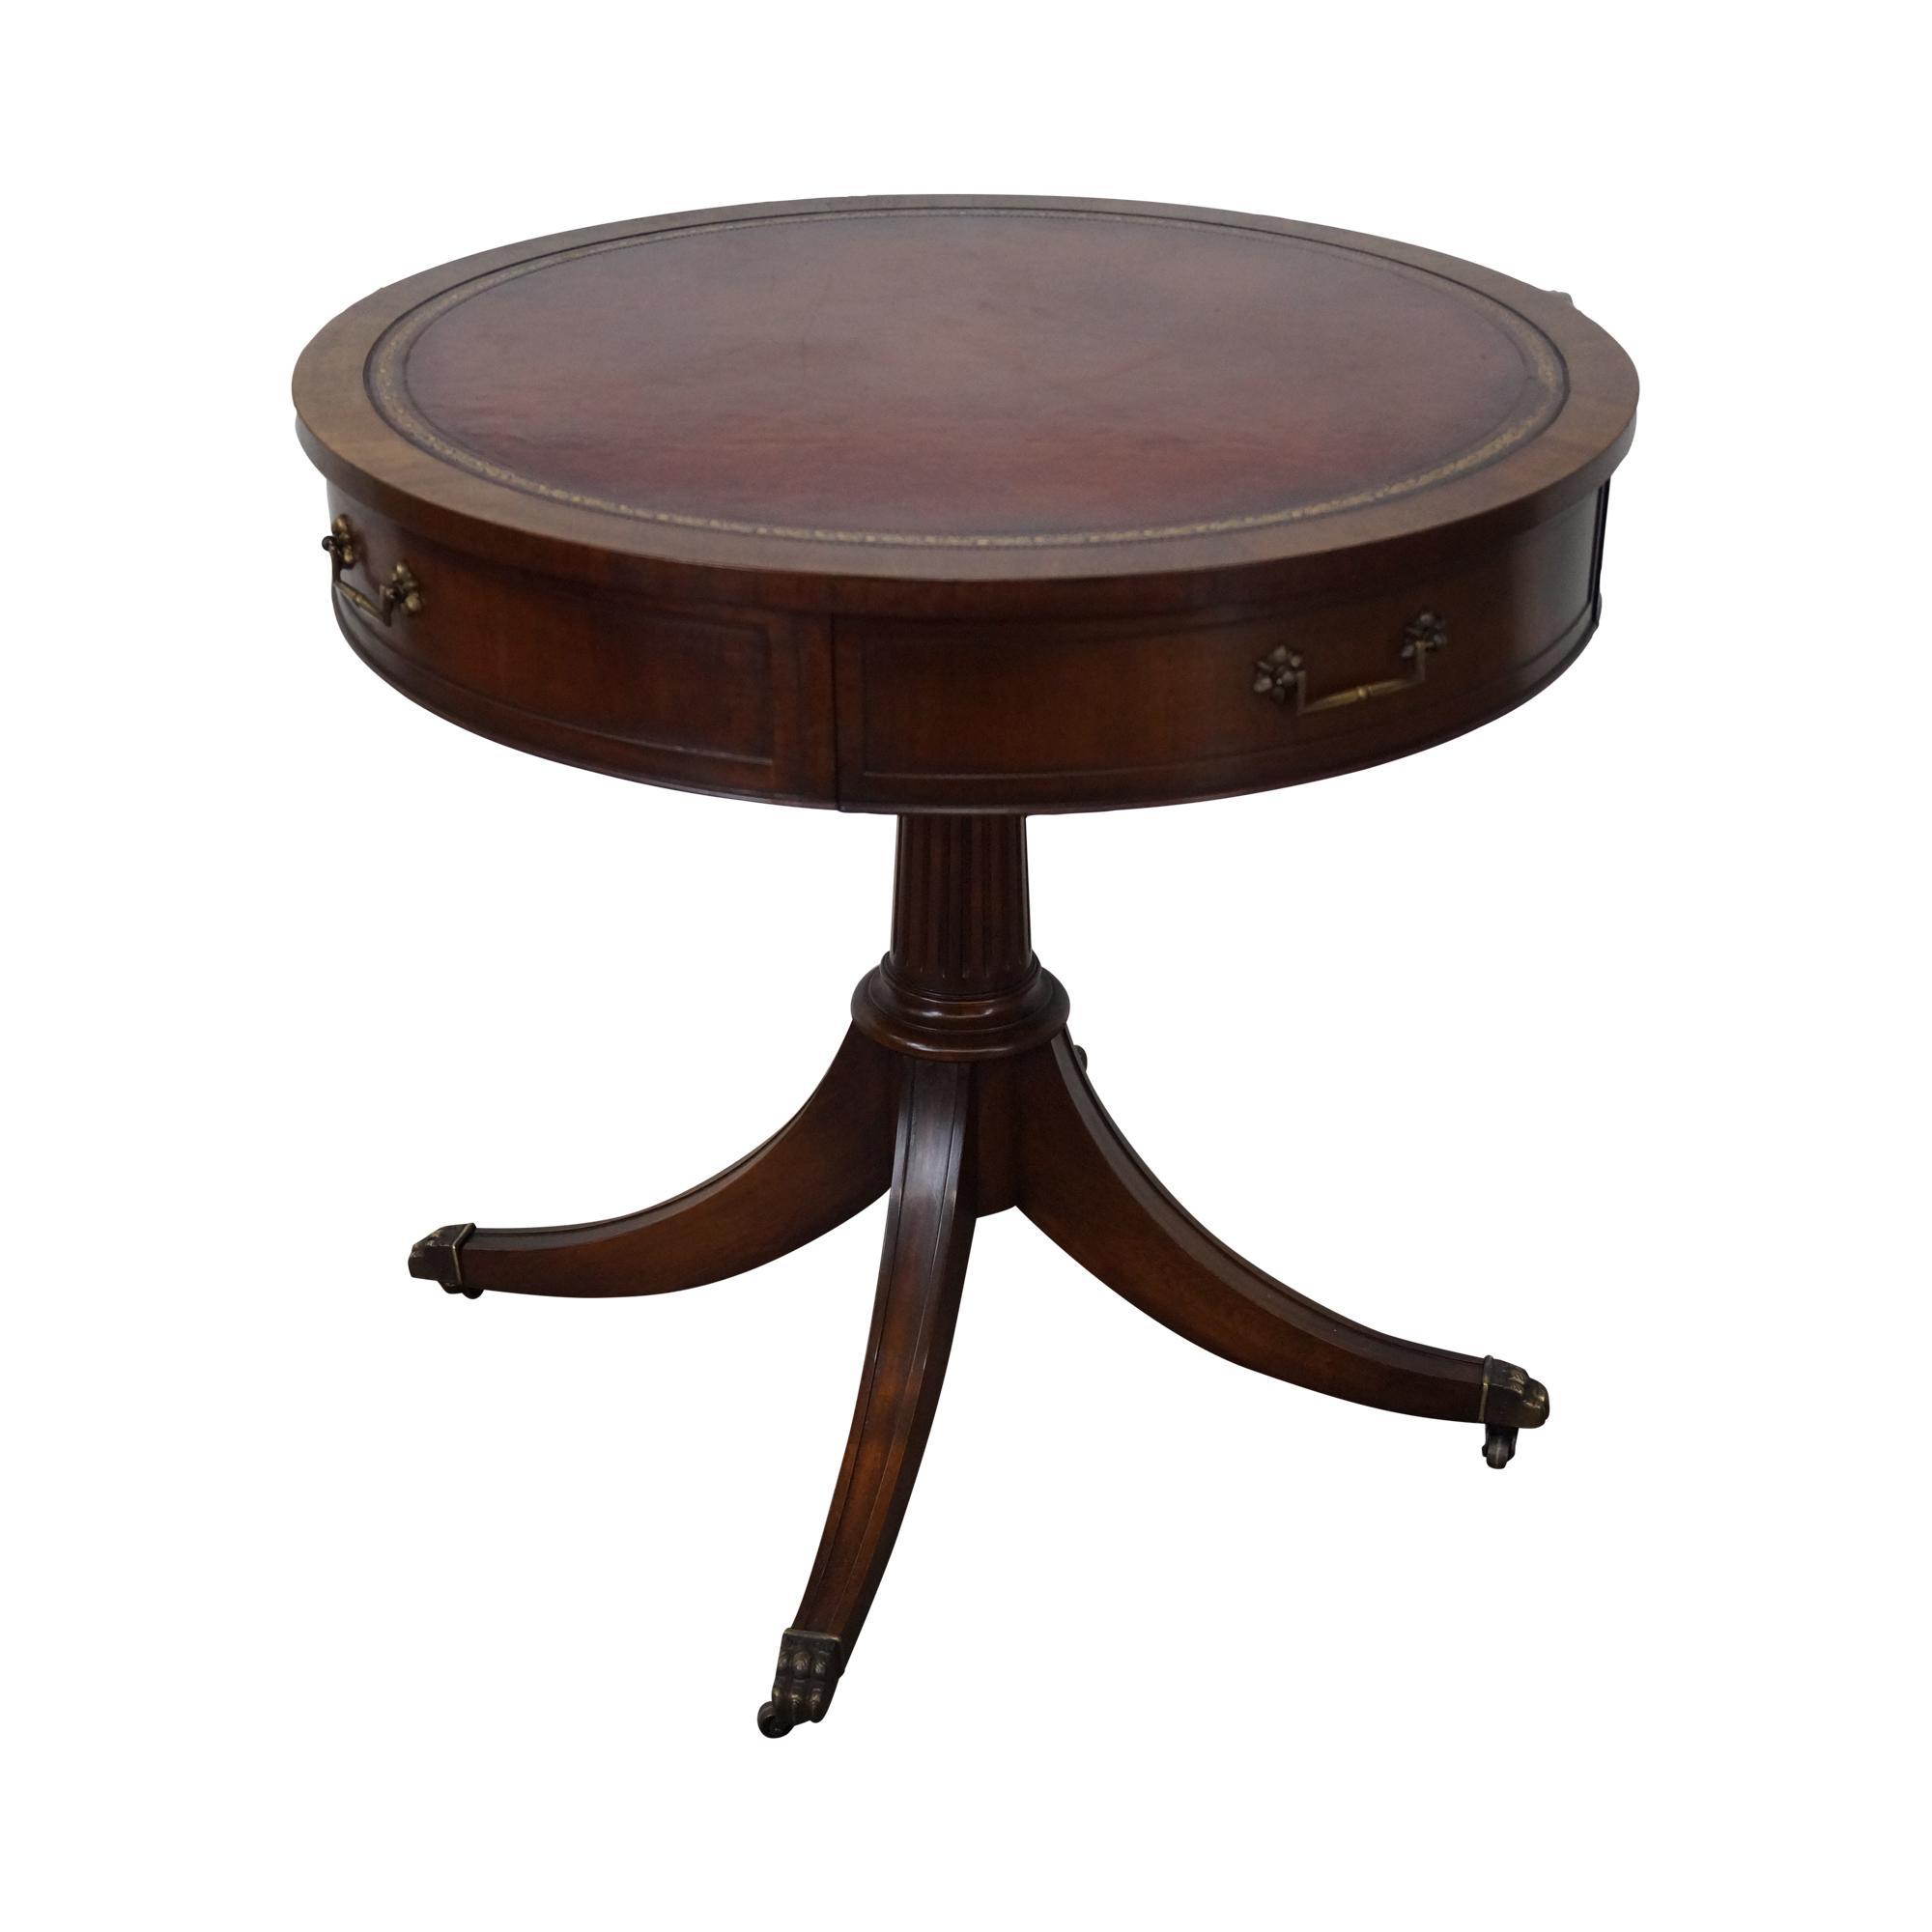 Prime Weiman 1940S Mahogany Round Leather Top Drum Table Inzonedesignstudio Interior Chair Design Inzonedesignstudiocom